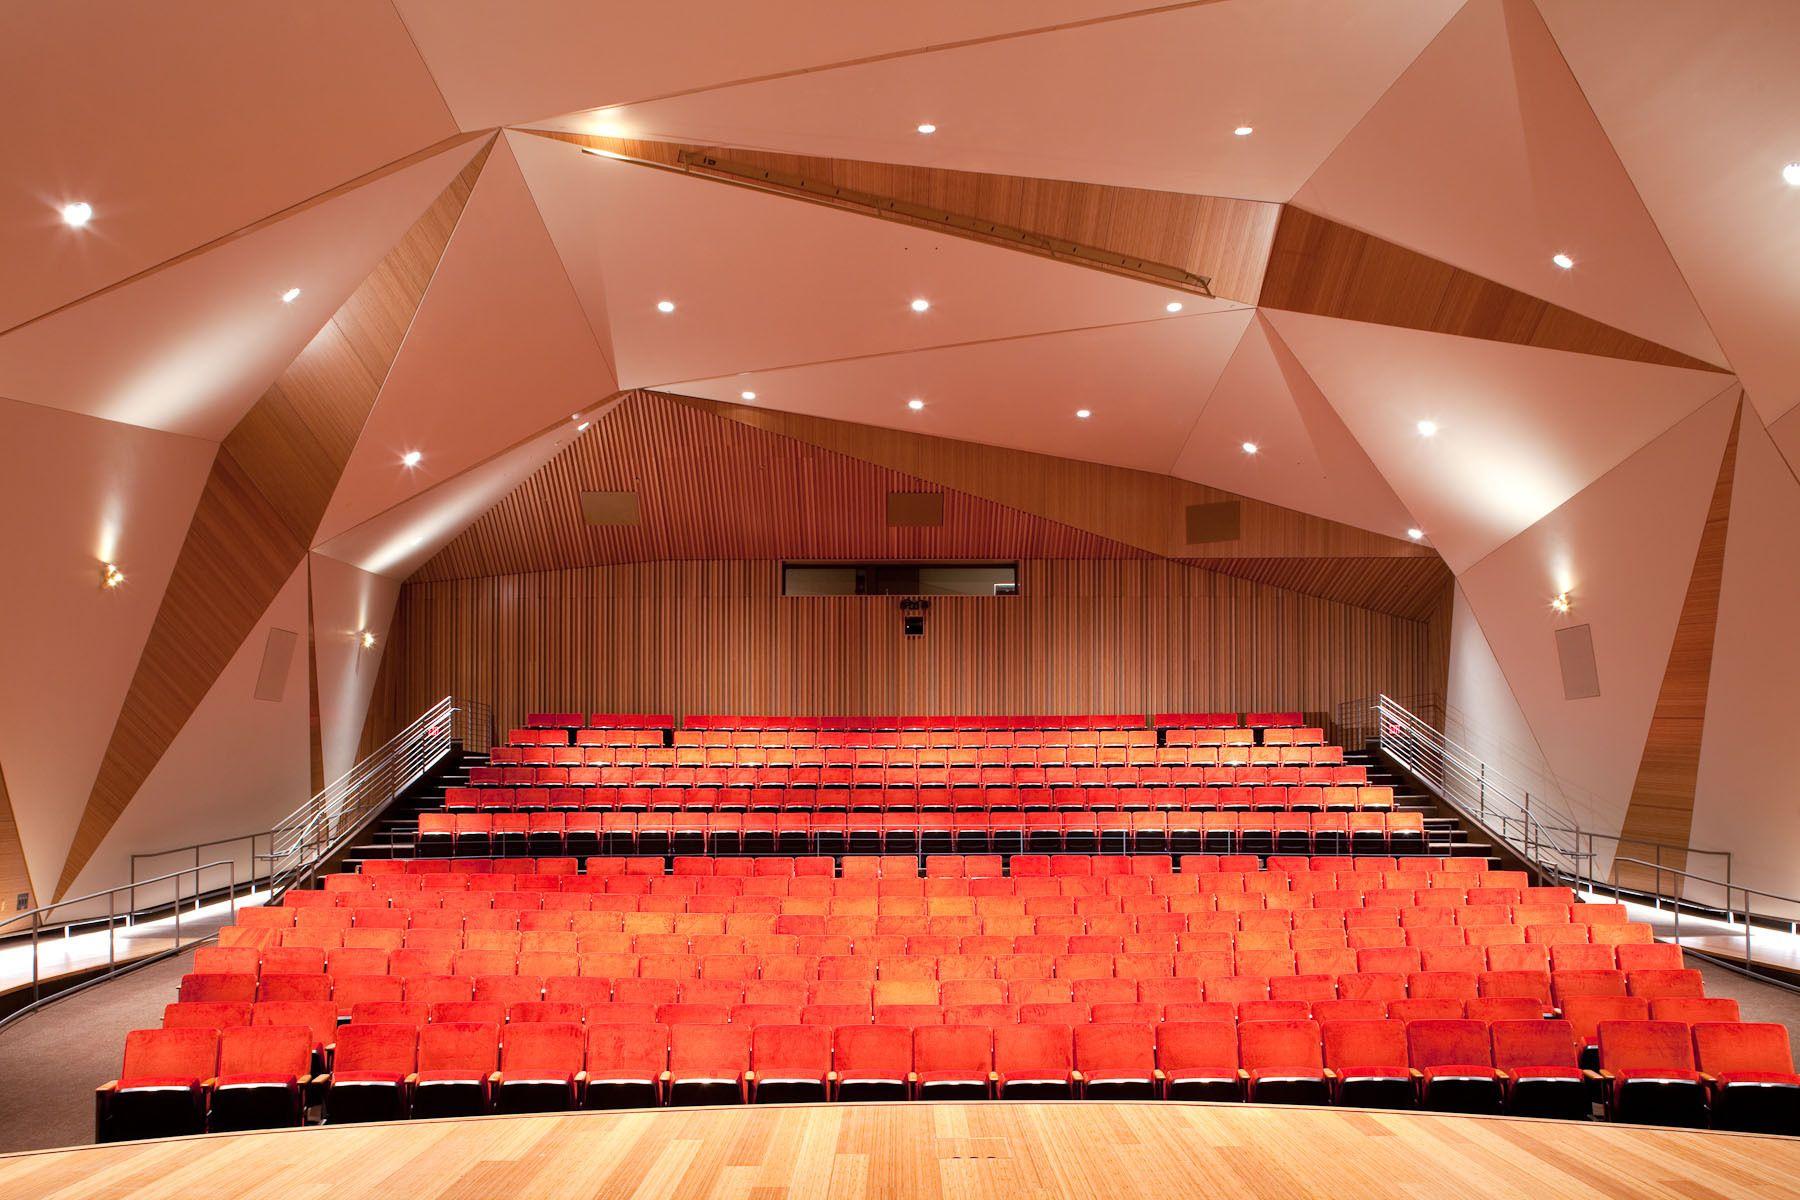 Conrad Prebys Music Hall UC San Diego